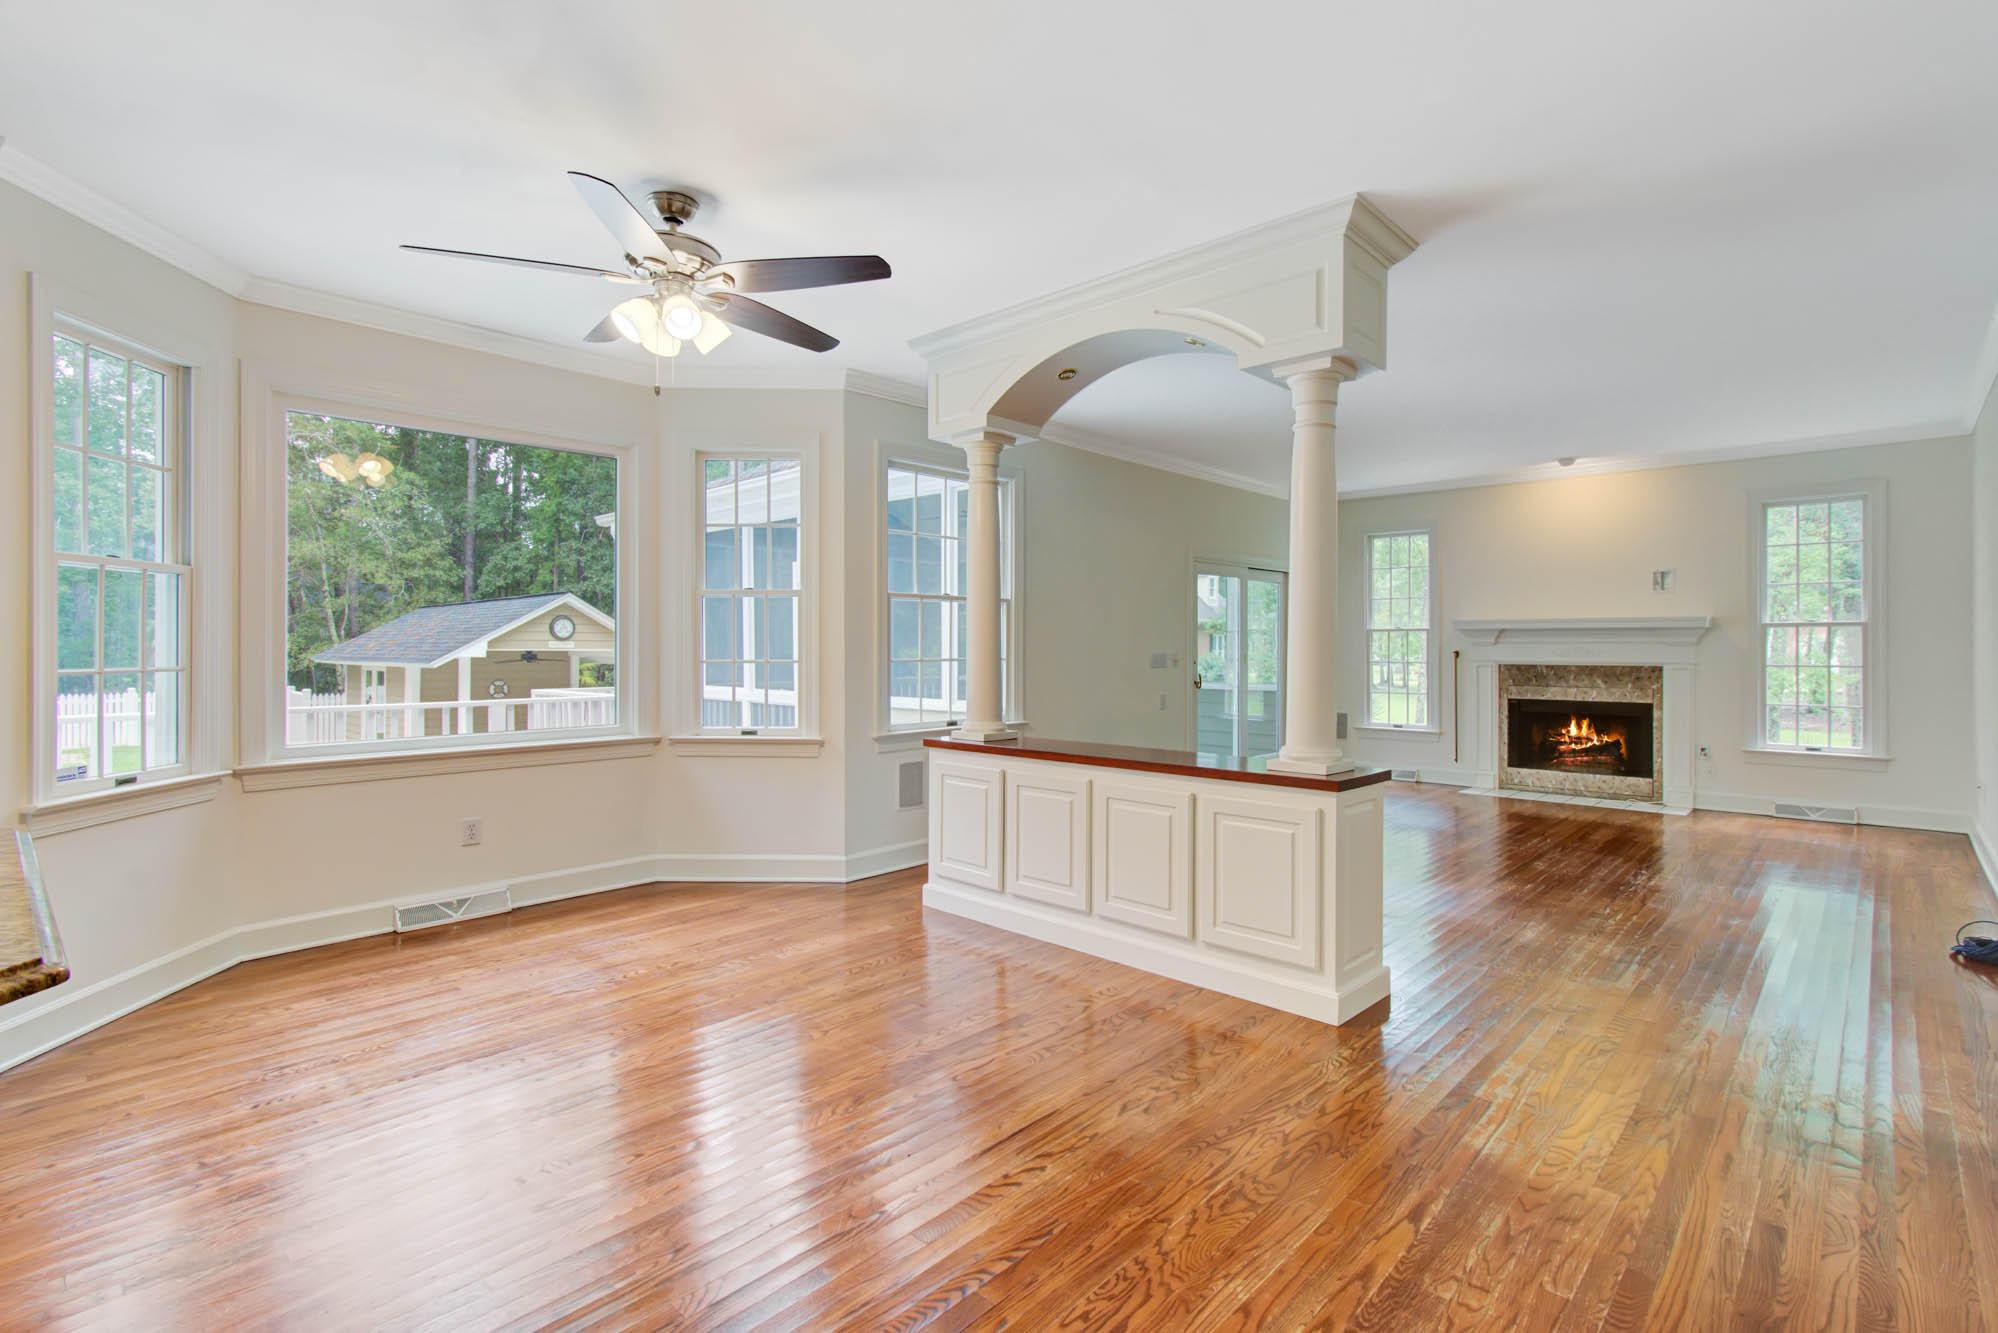 Dunes West Homes For Sale - 3515 Colonel Vanderhorst, Mount Pleasant, SC - 48